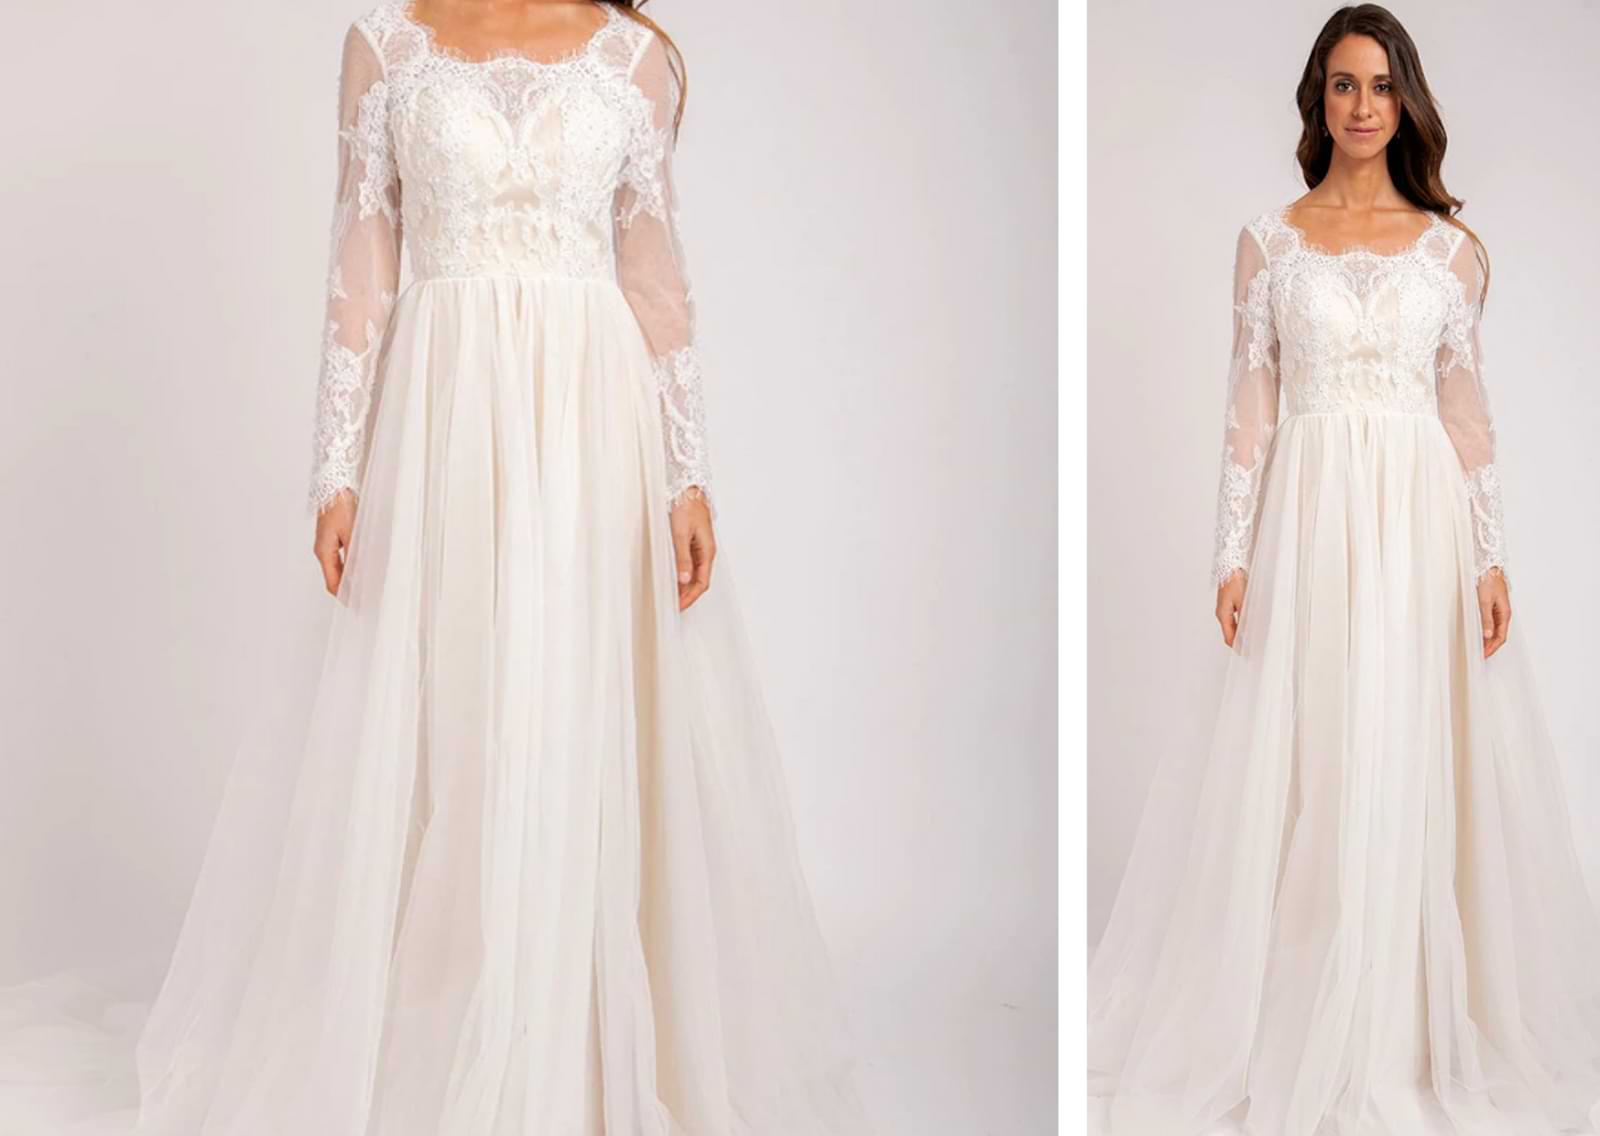 Wedding White Dress